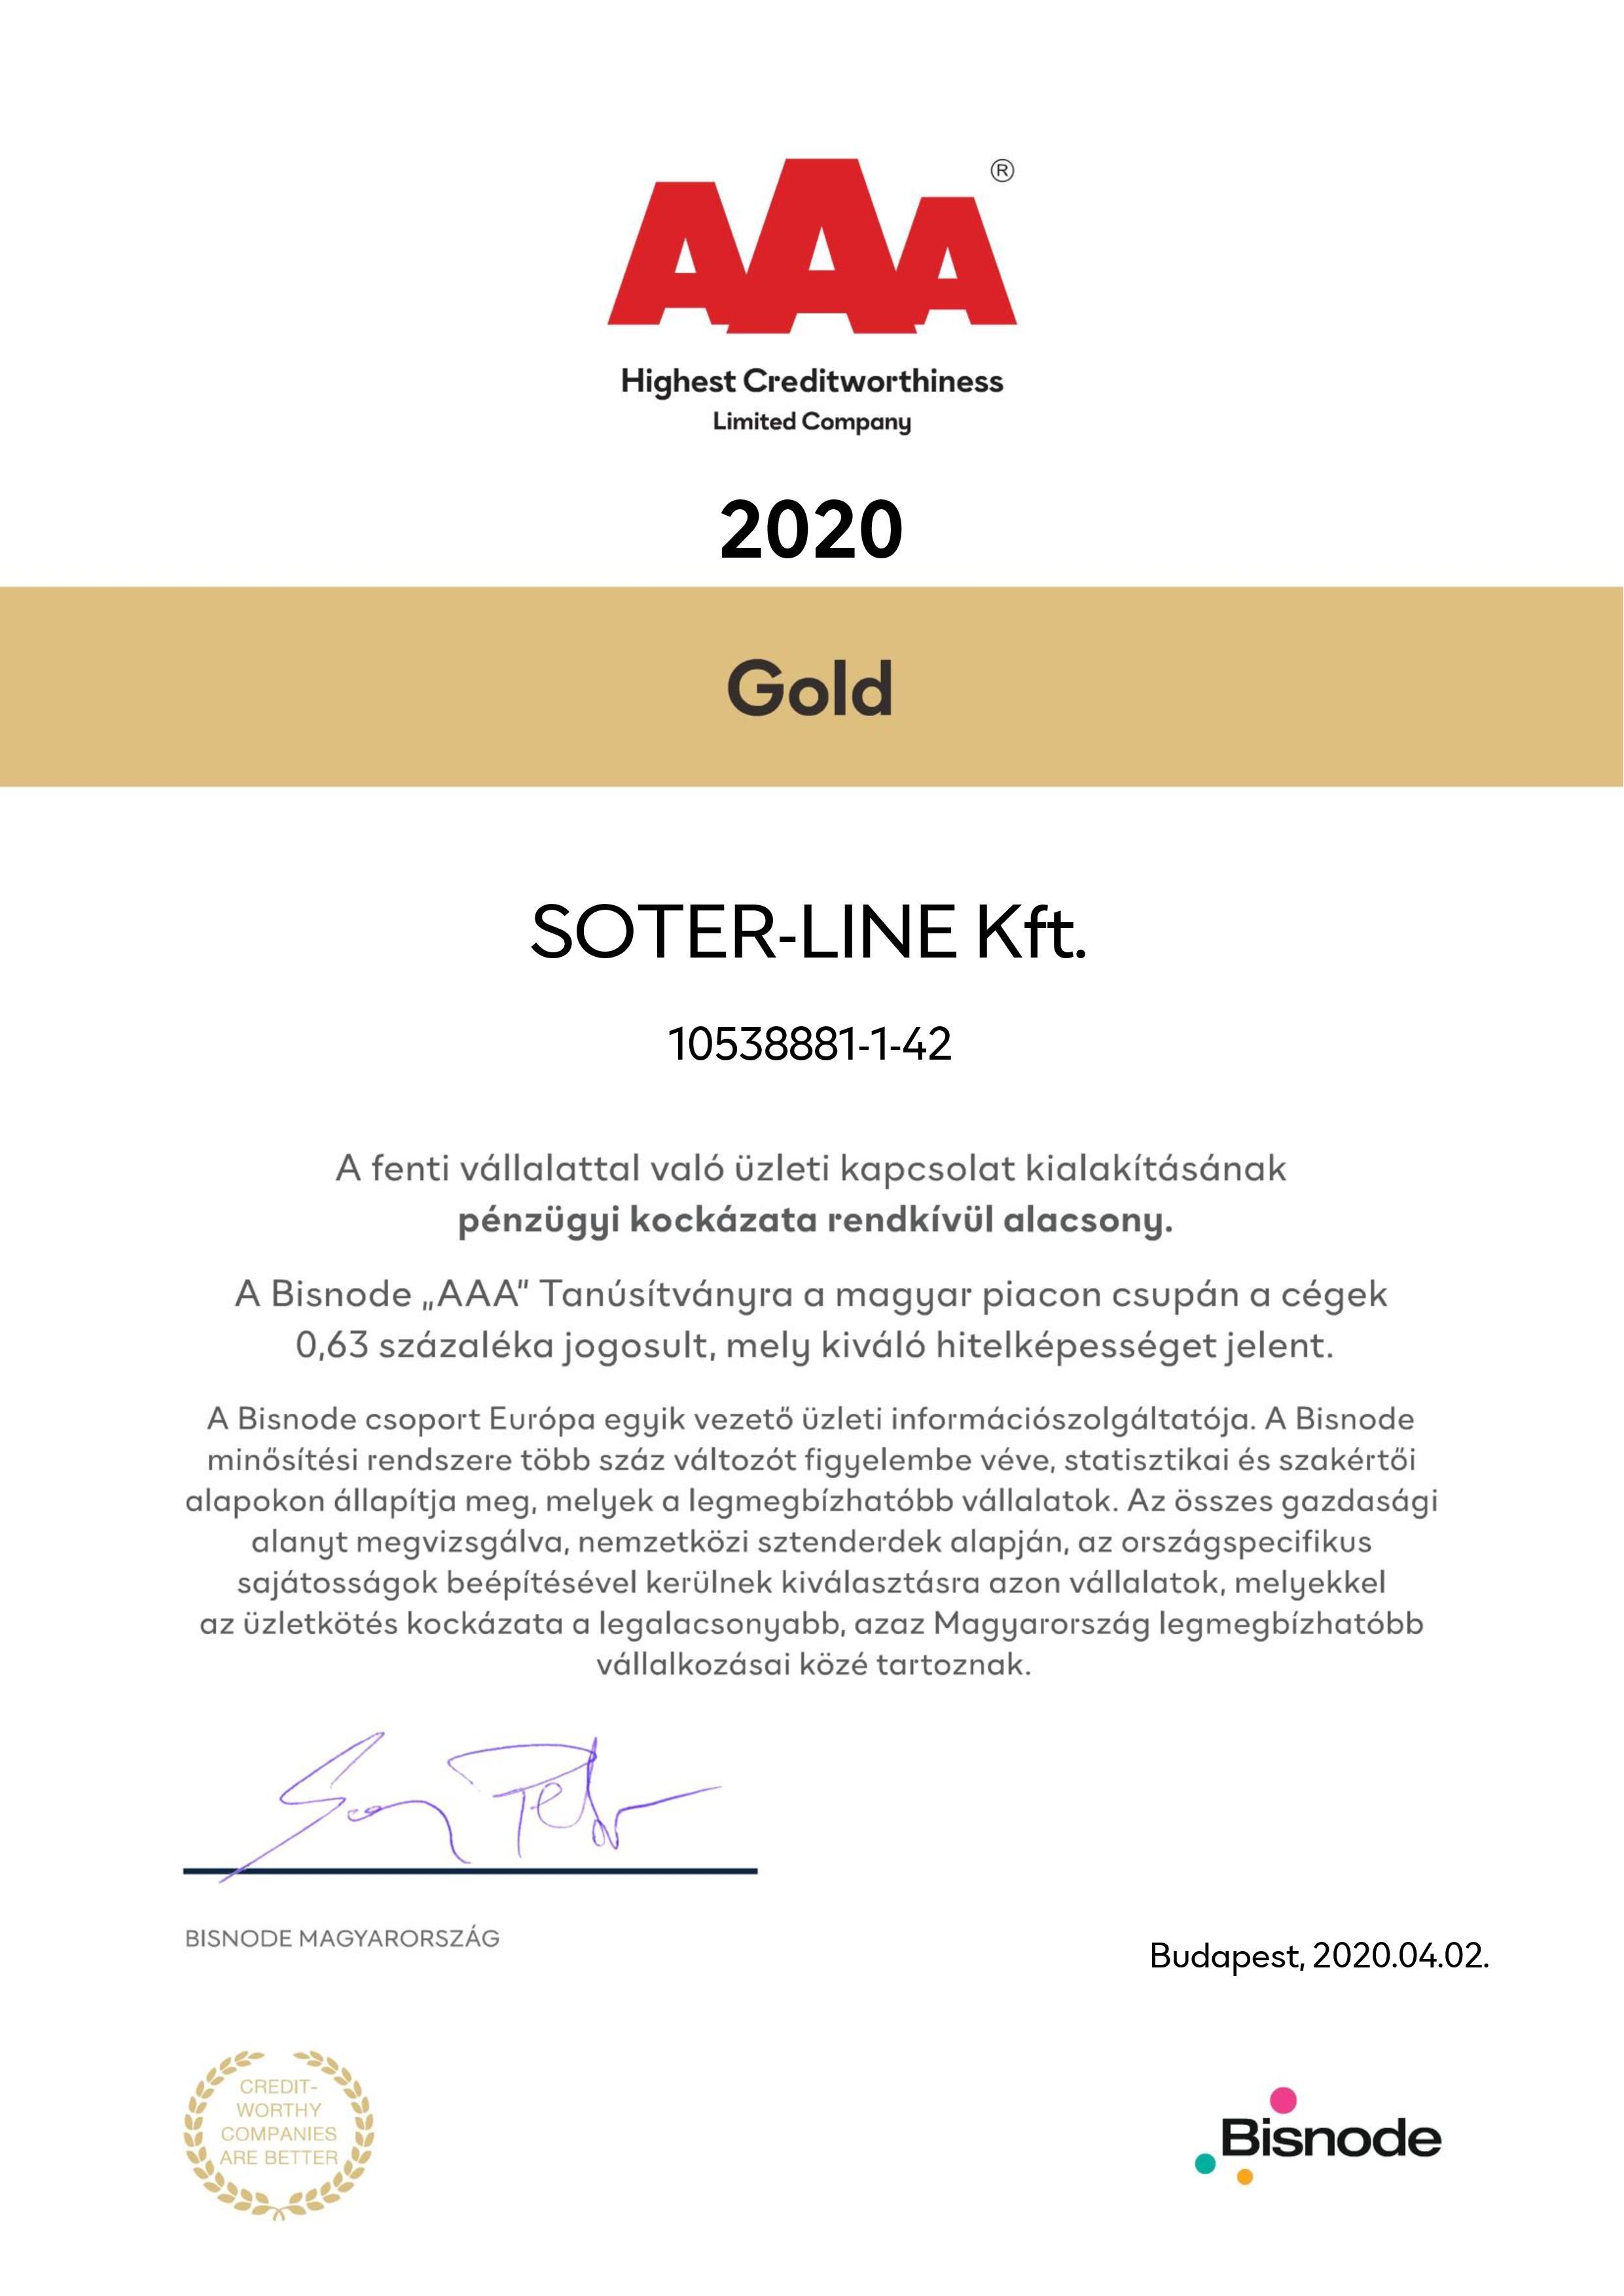 Bisnode 2020 gold tanúsítvány